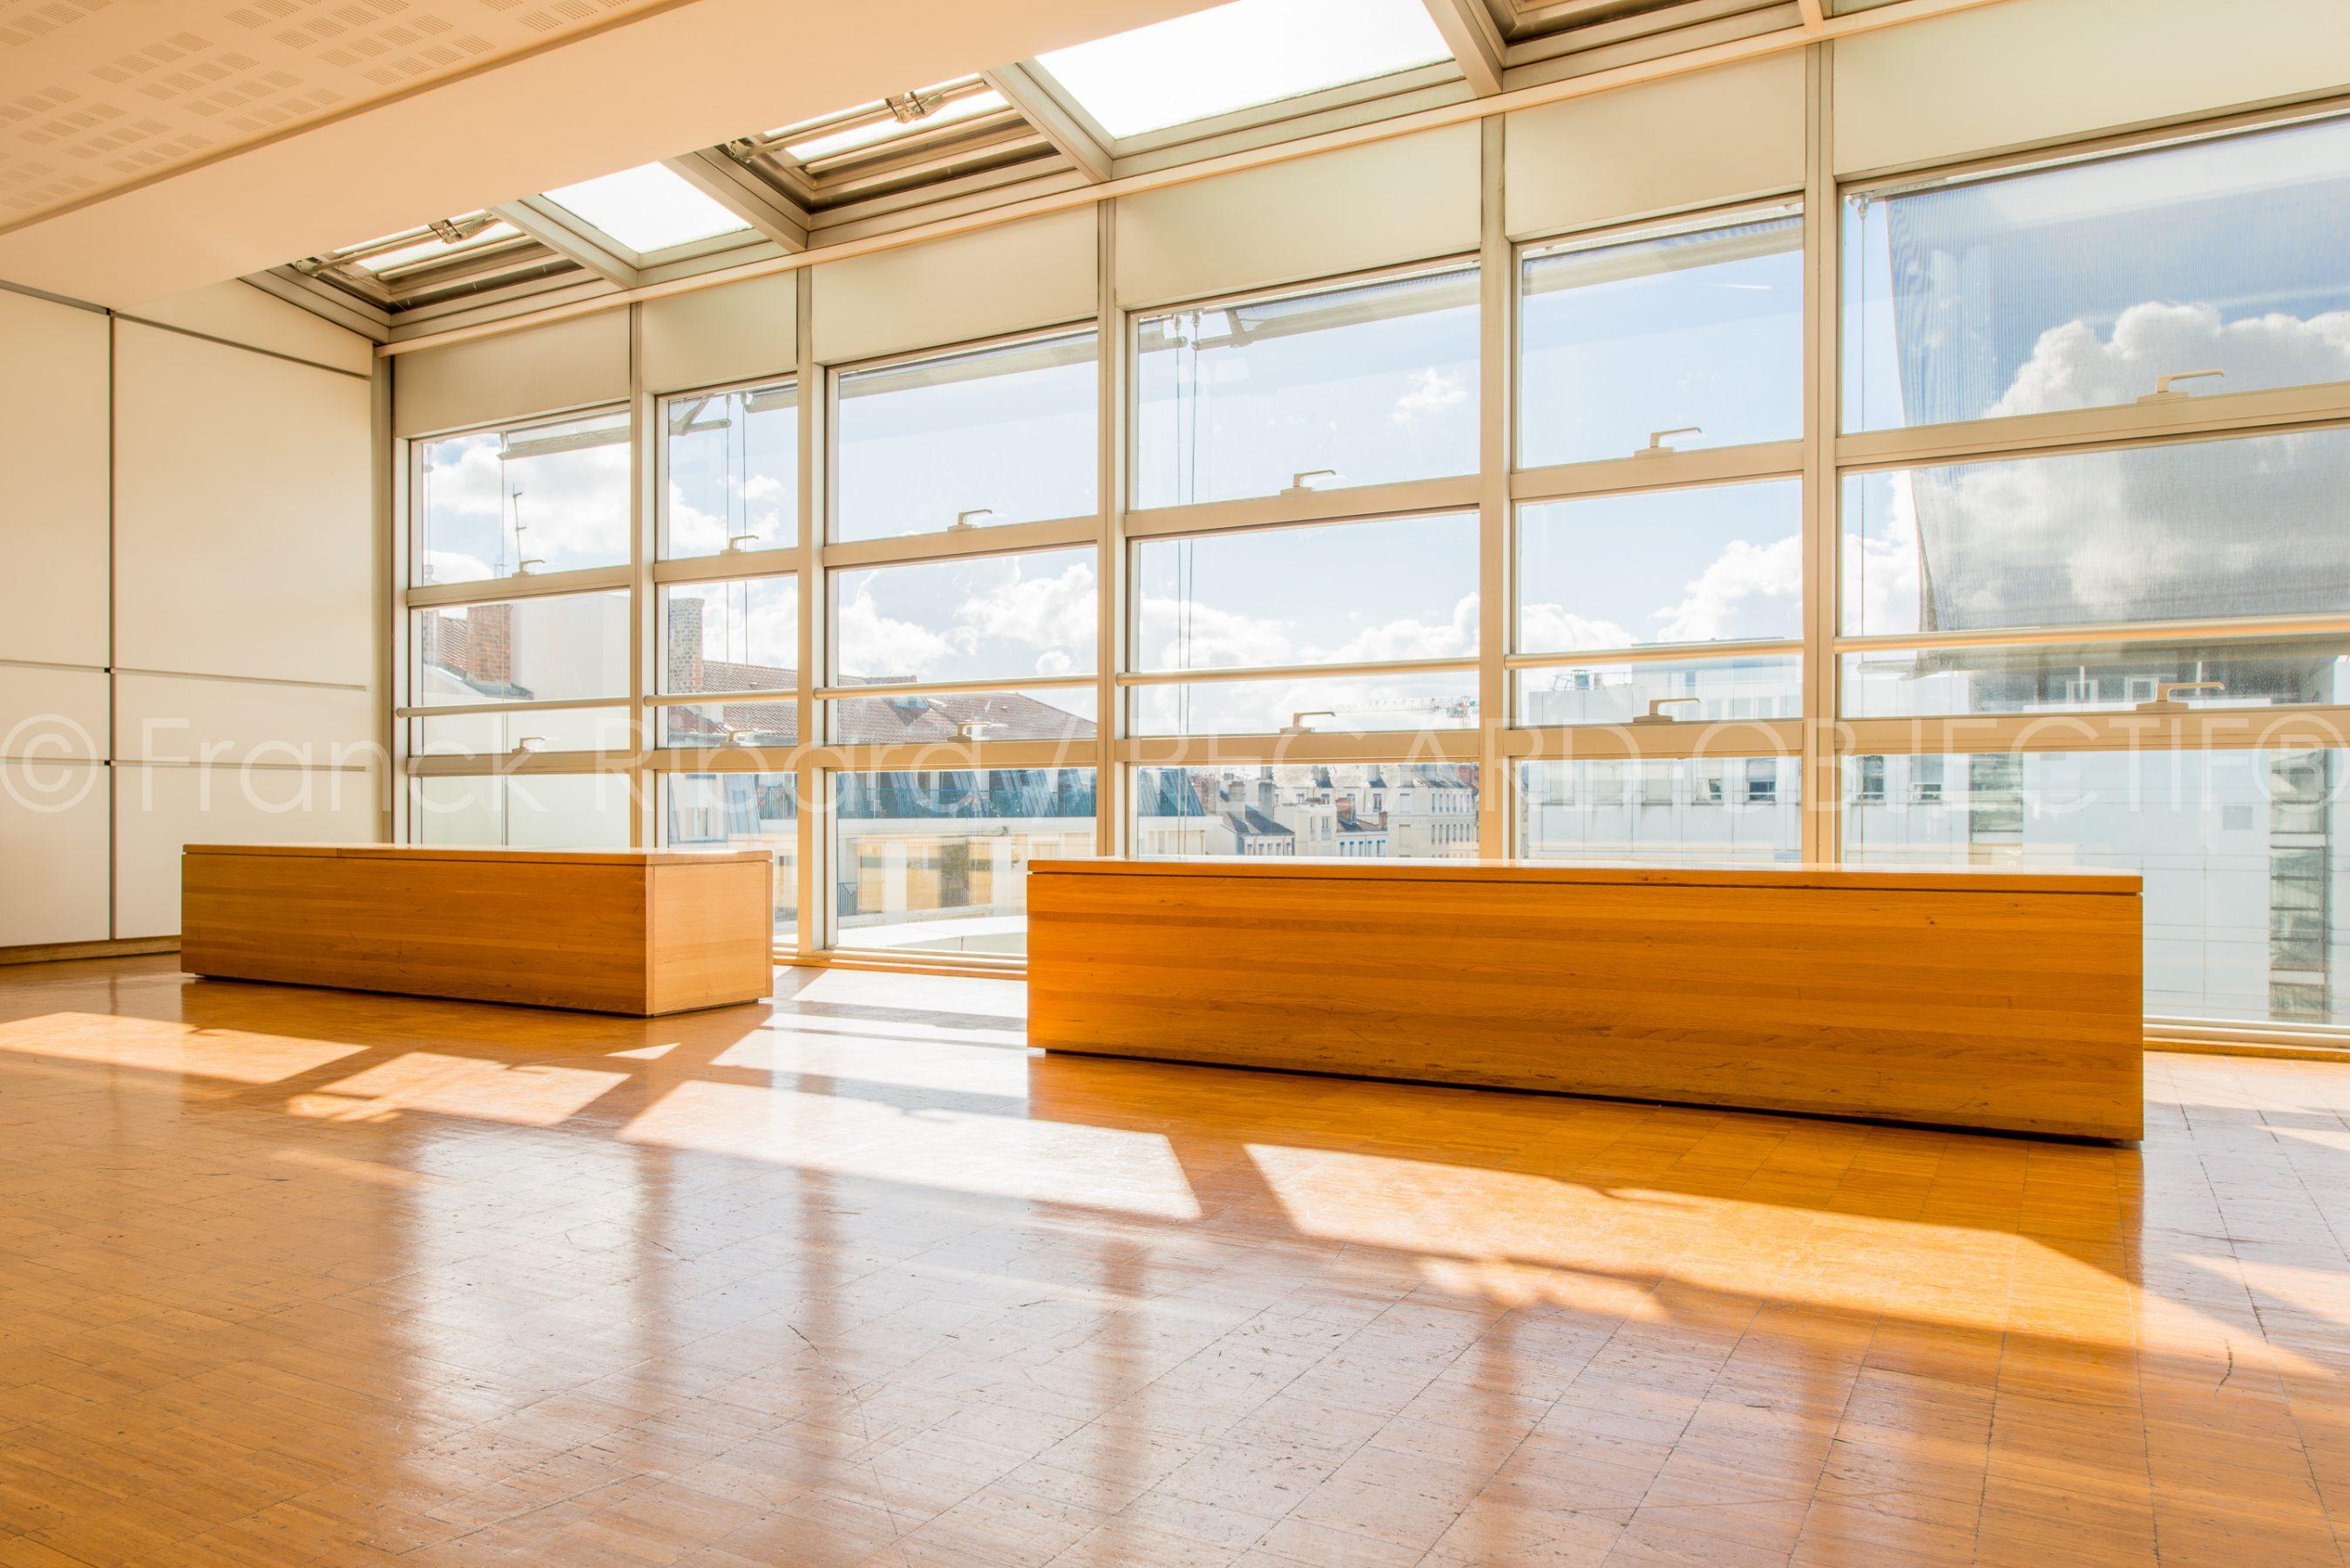 photographie de franck ribard - regard objectif - photographe architecture lyon - Université Lyon 3